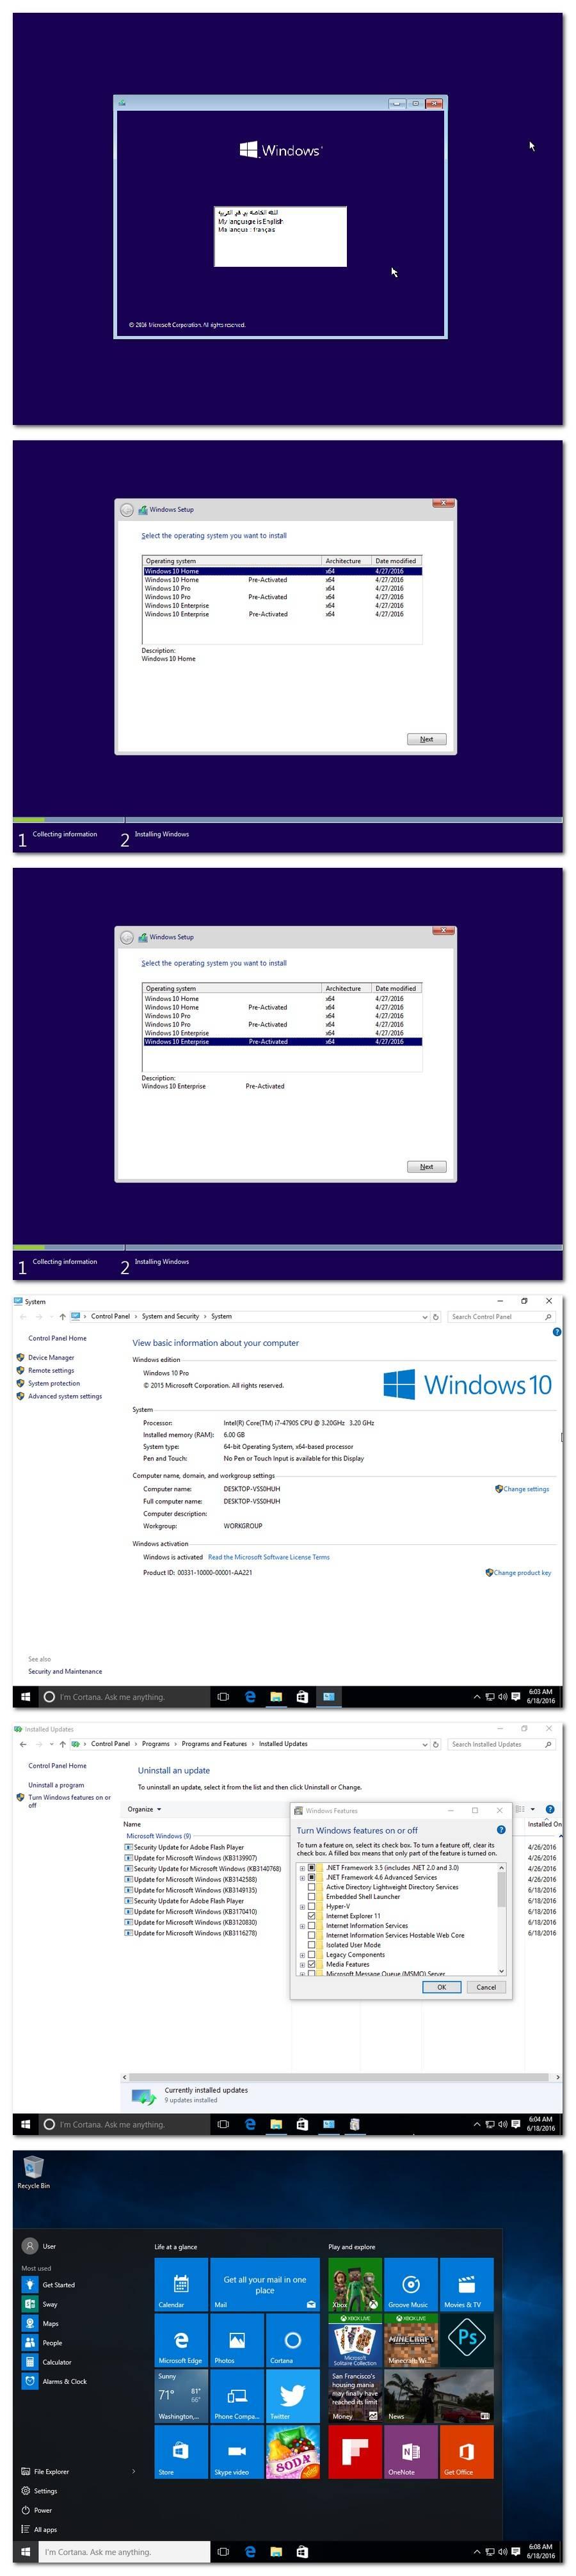 Microsoft Windows 10 Aio 1511 2 June 2016 Multilingual Full